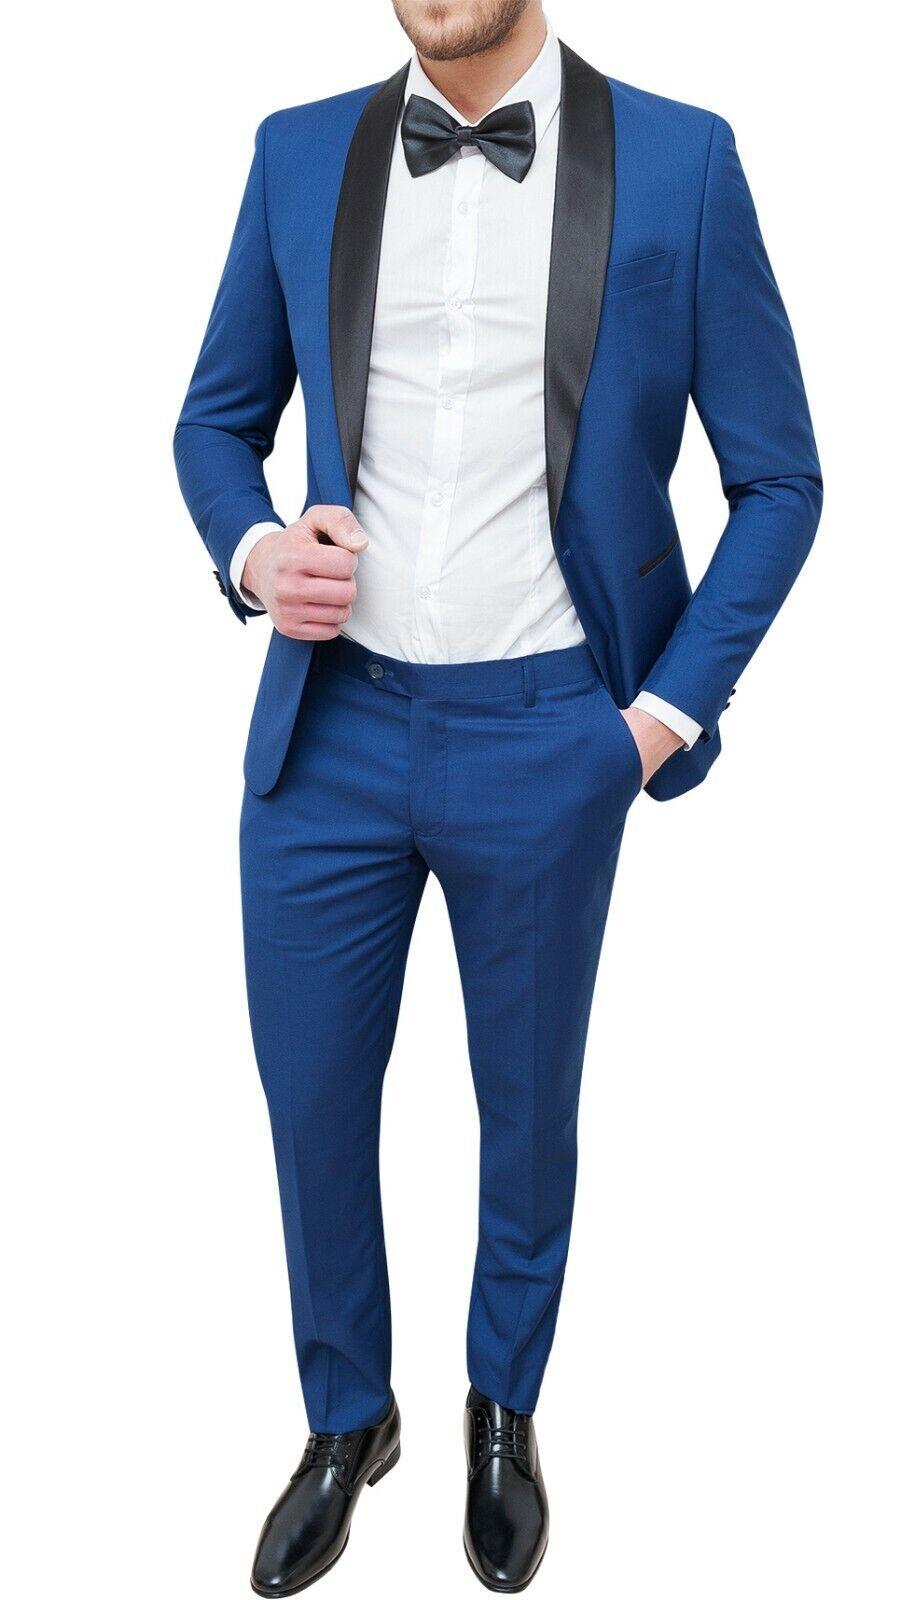 SUIT COMPLETE MAN SARTORIALE blueE LIGHT SLIM FIT TIGHT SMOKING da 42 a 58